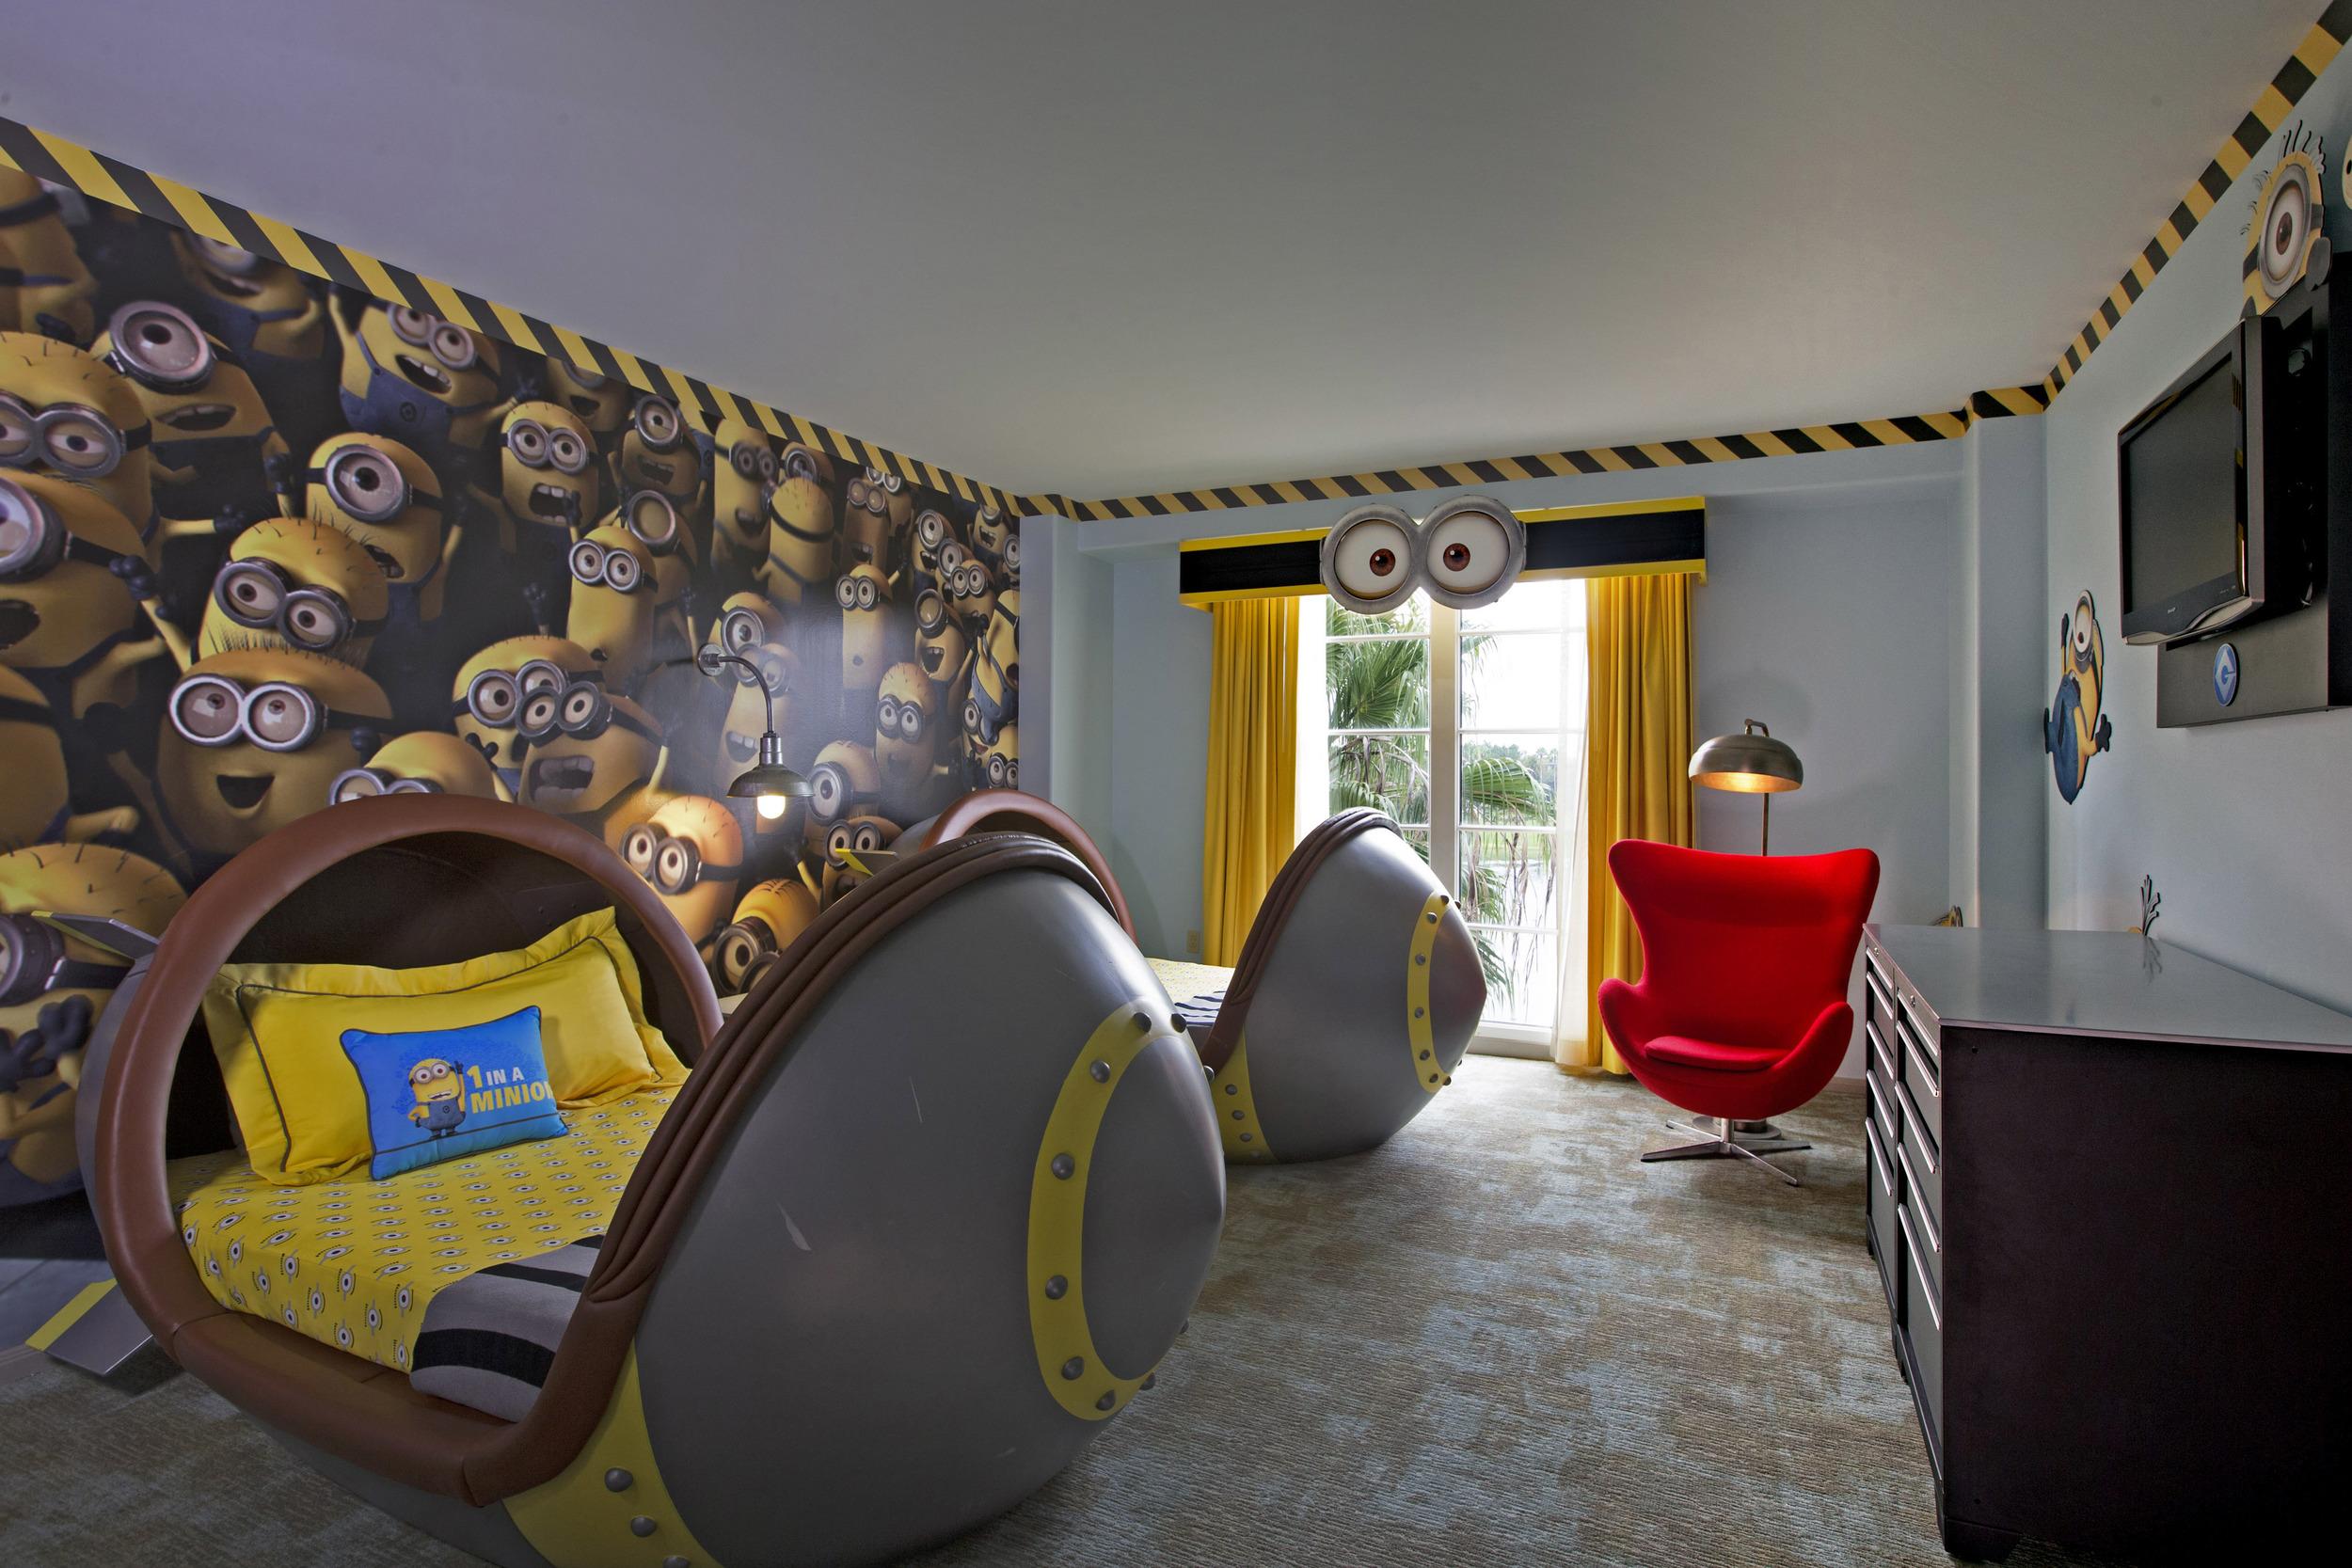 Loews Portofino Bay Resort Despicable Me Kids Suite. Image credit: Universal Orlando Resort.